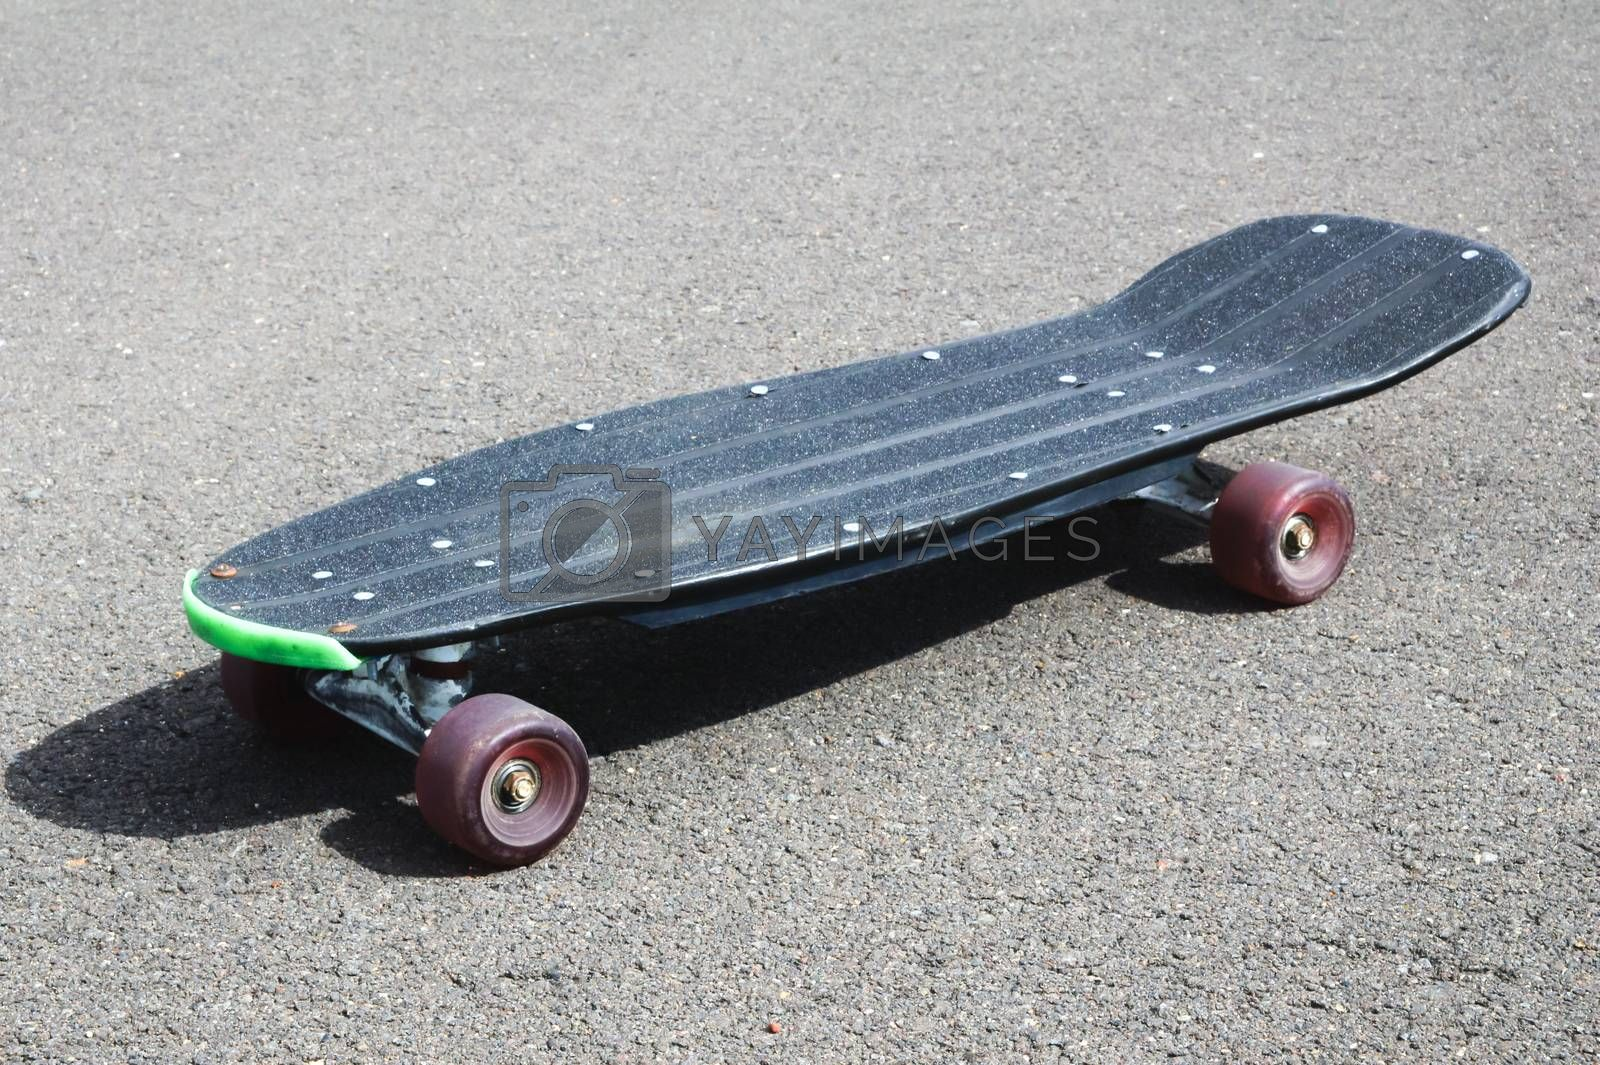 Royalty free image of Vintage Style Longboard Black Skateboard by underworld